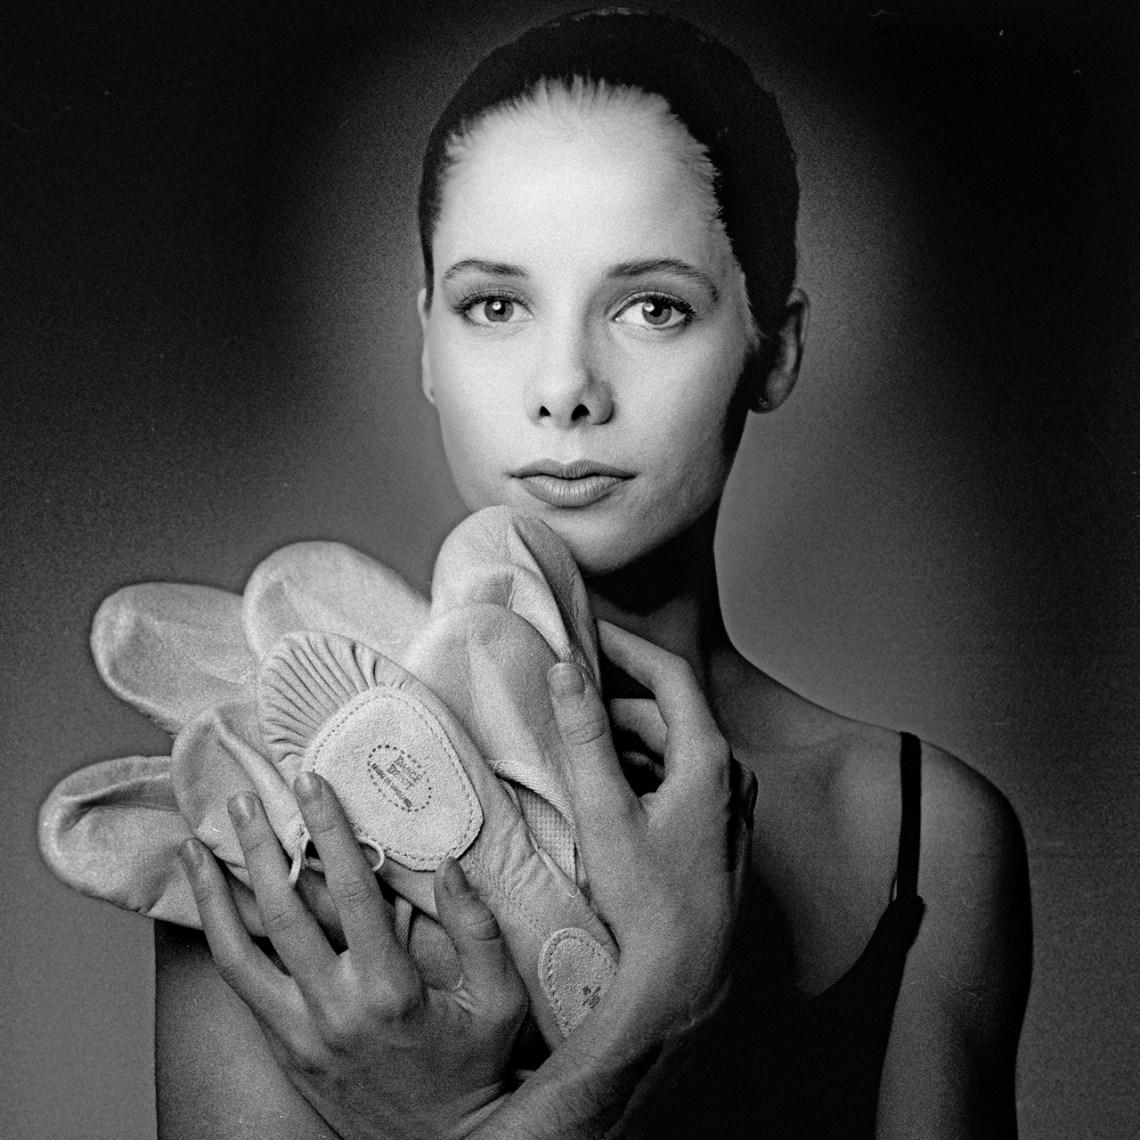 D'arcy-Bussel-ballet-shoes.Corect.Arrowsmith.©.jpg